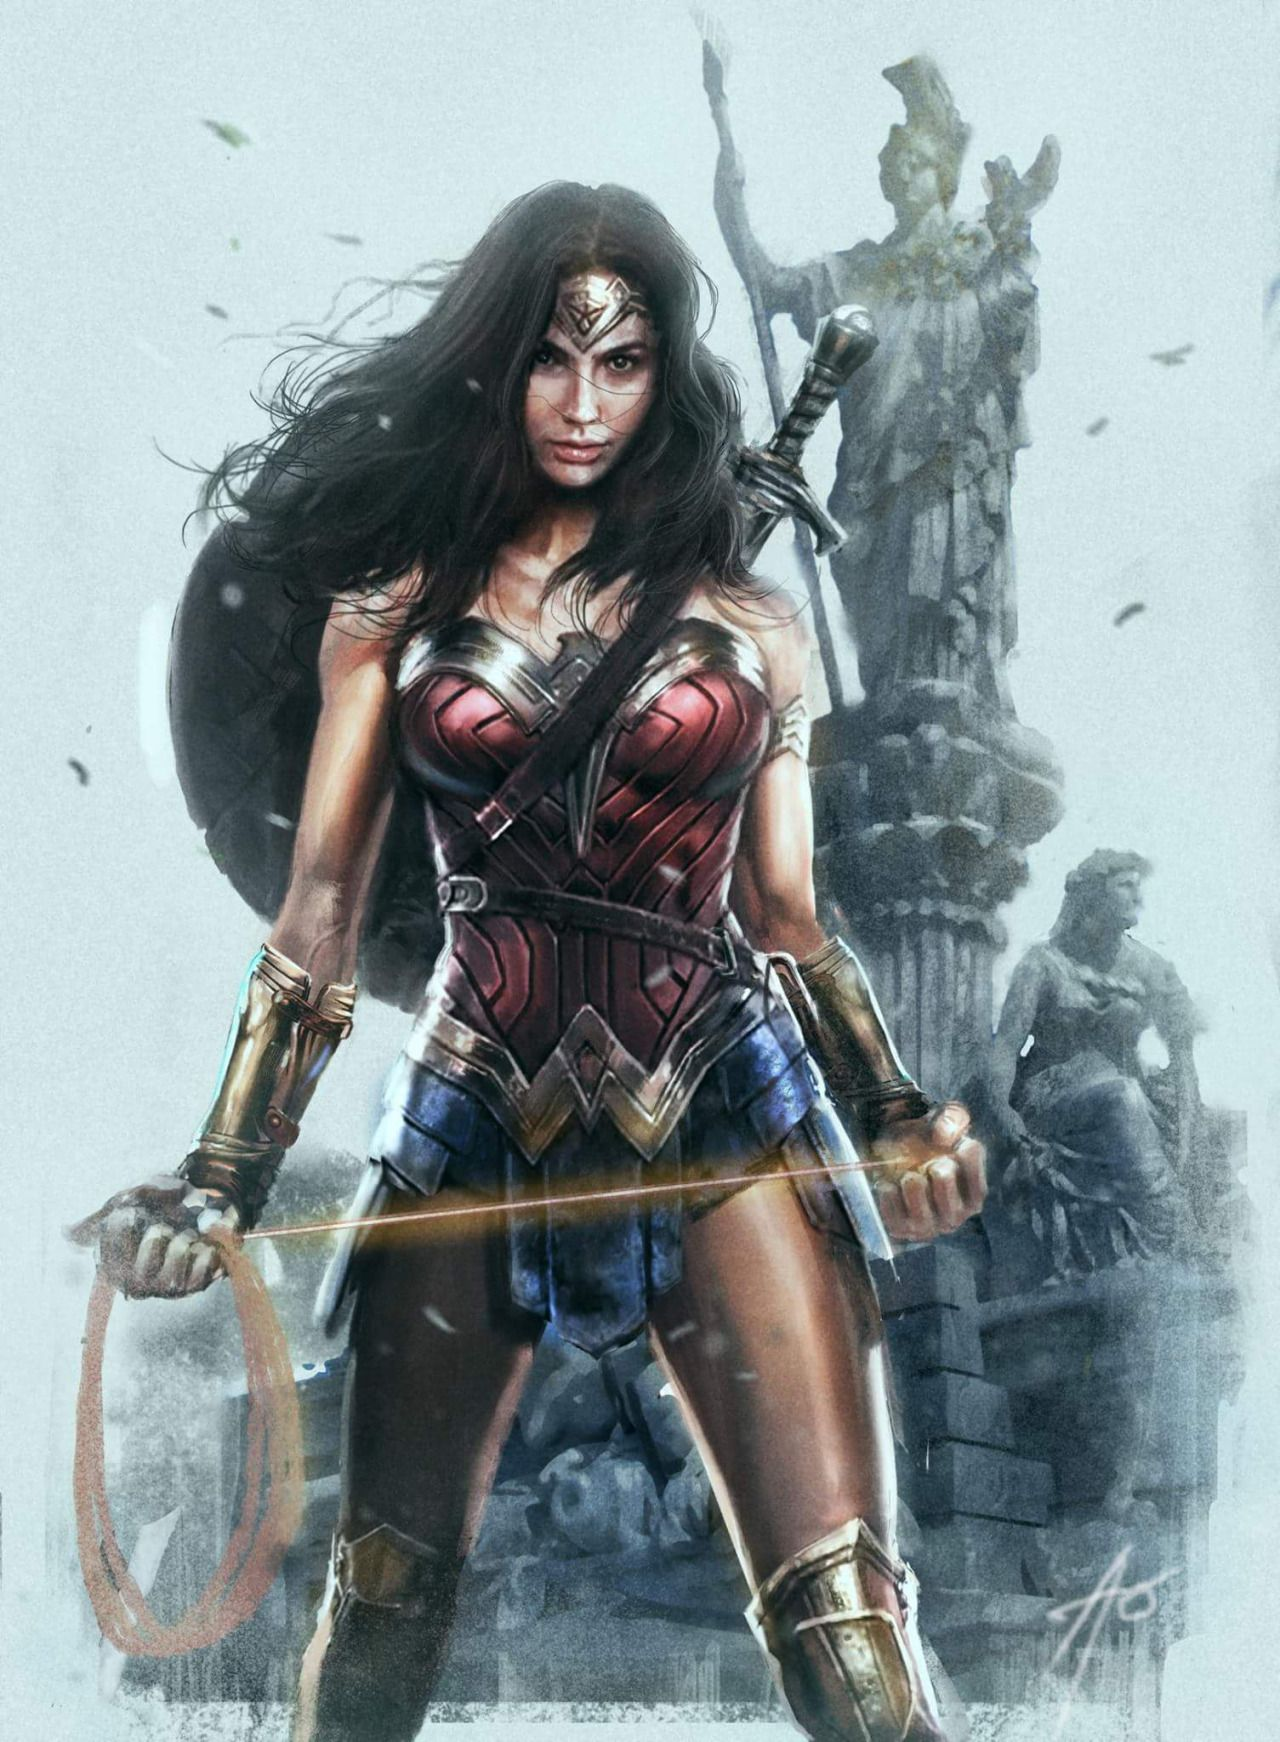 Wonder Woman Amazon Princess Rudy Ao Wonder Woman Art Wonder Woman Gal Gadot Wonder Woman